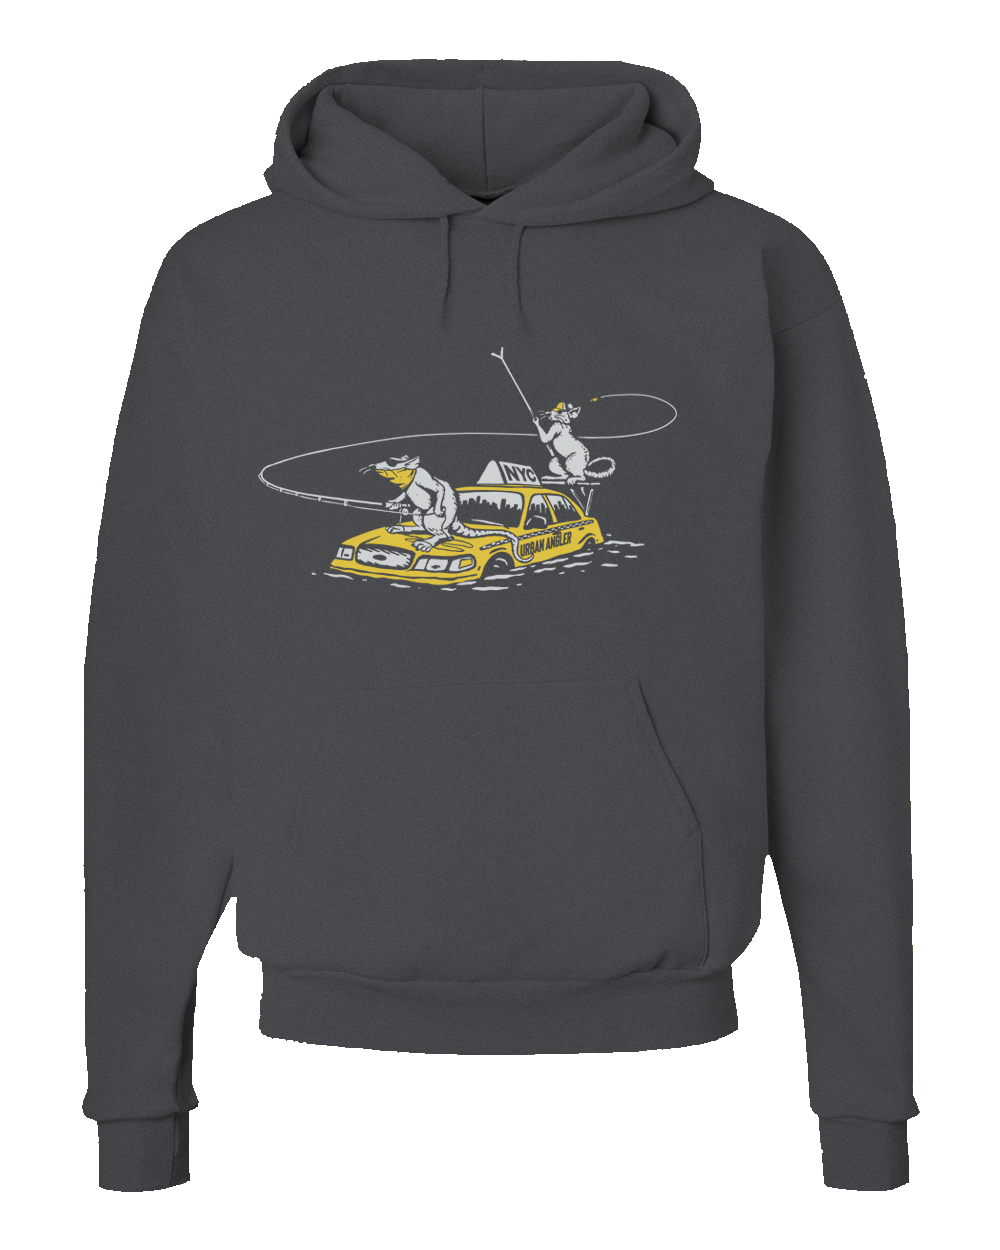 Urban Angler Shop Rats Logo Hoodie